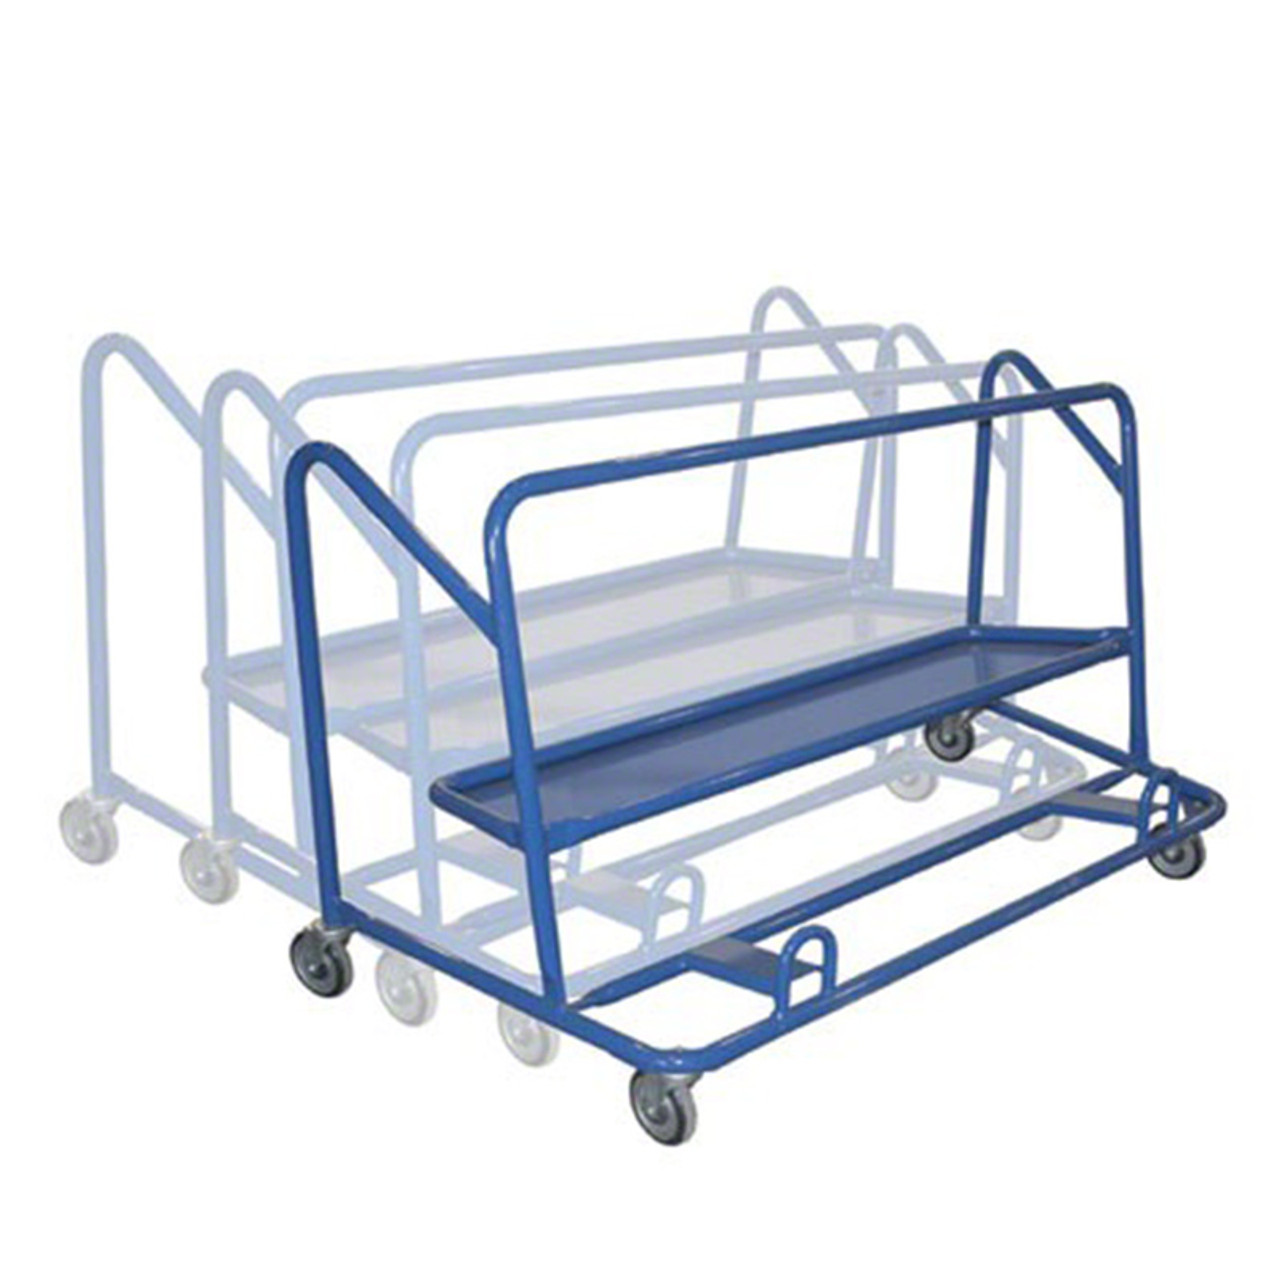 Nestable Panel Carts